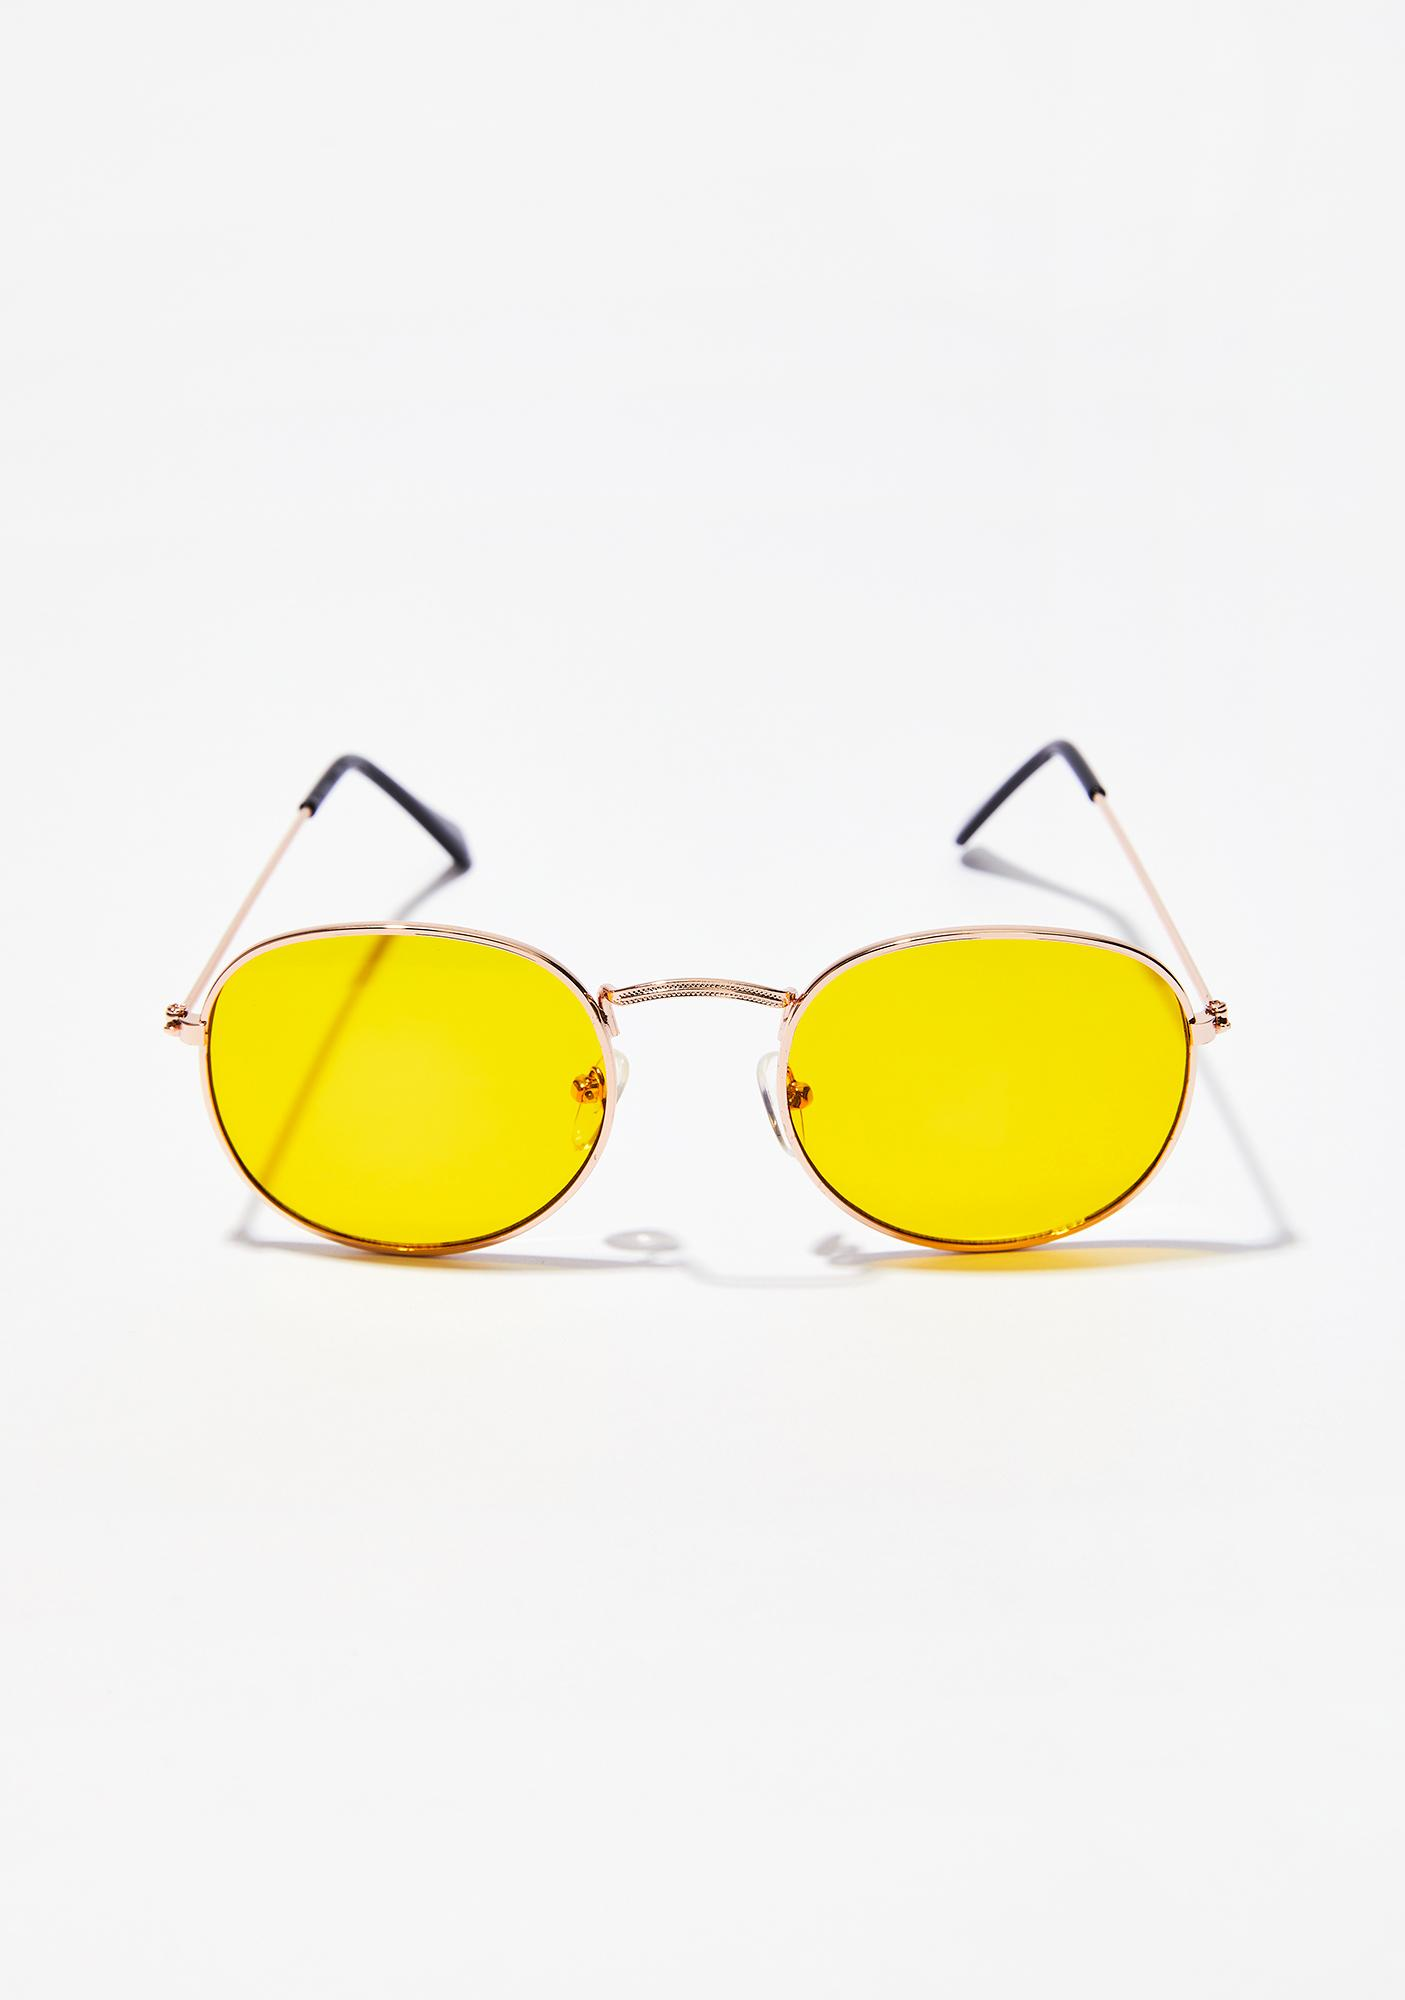 Look Alive Sunglasses